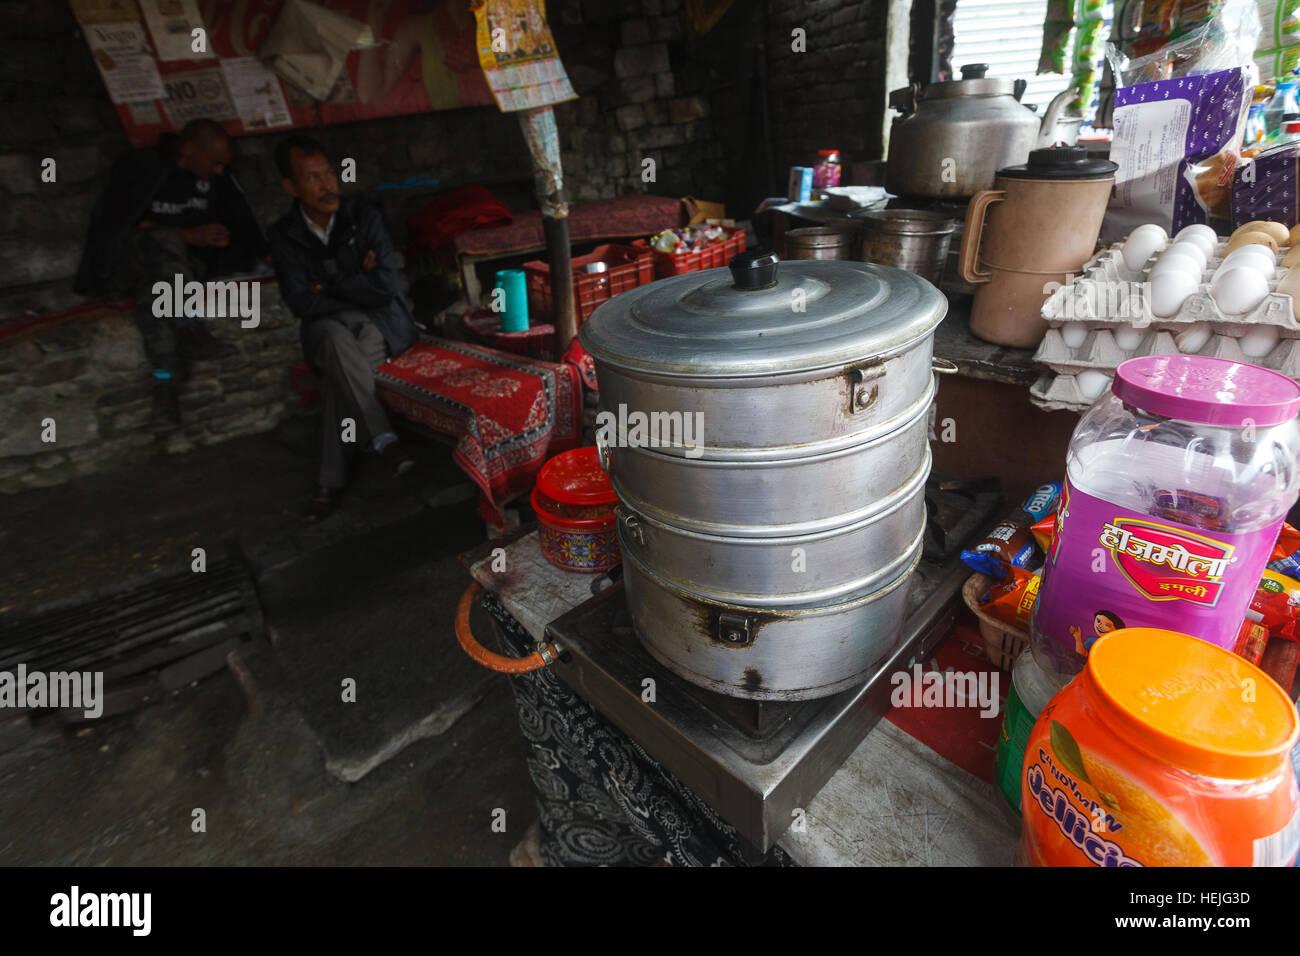 Siddu steamer in a street cafe in Naggar village, Himachal Pradesh, India - Stock Image